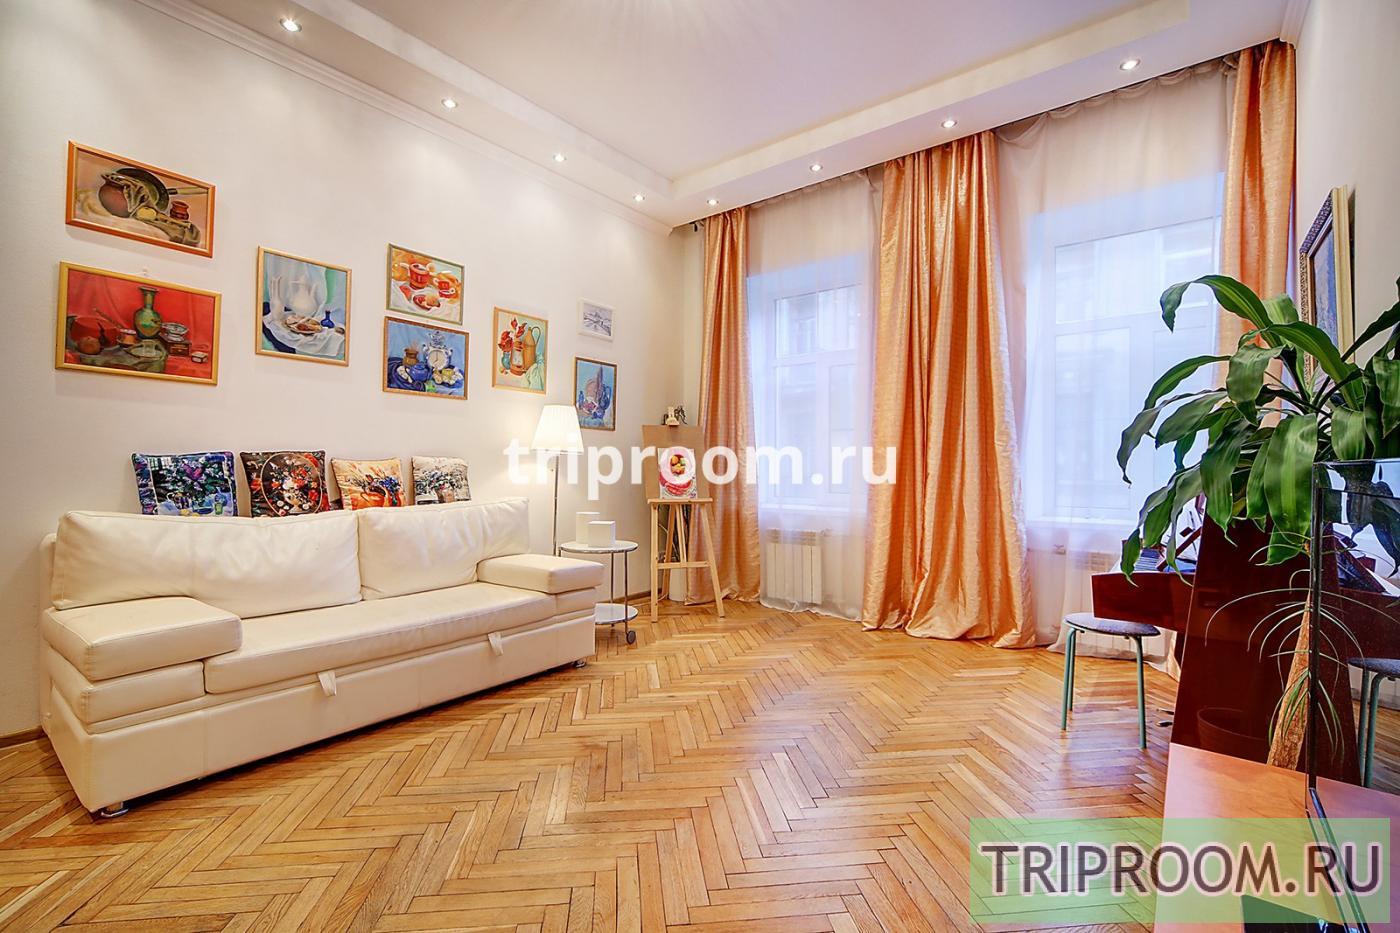 2-комнатная квартира посуточно (вариант № 15426), ул. Лиговский проспект, фото № 10